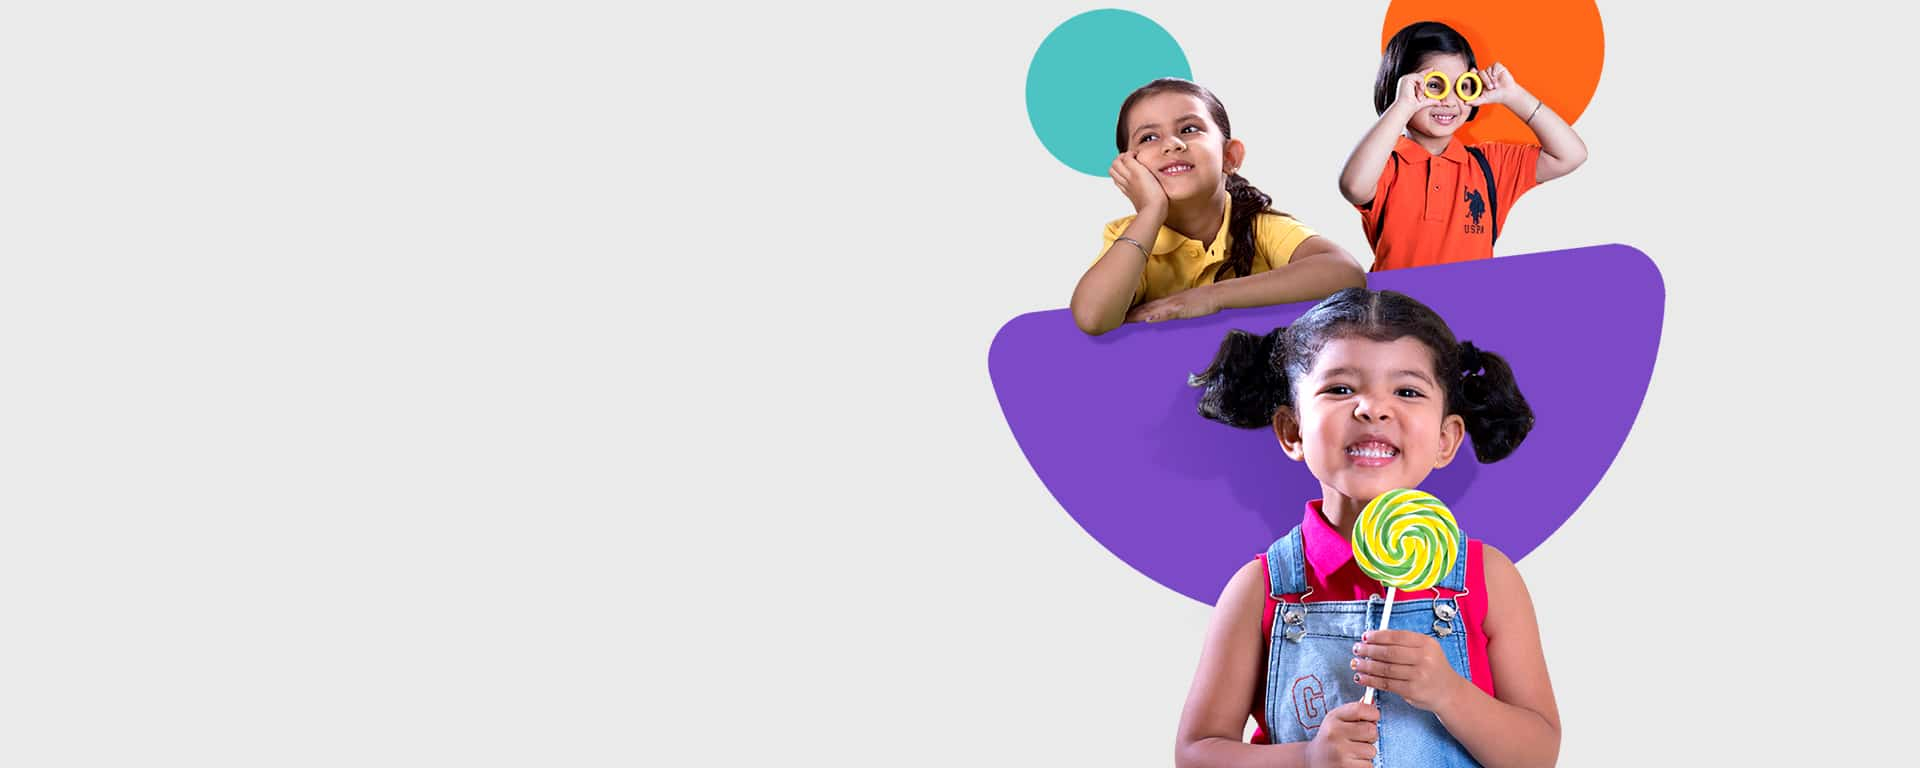 Pre School in Gurgaon - Beansprouts Pre-School